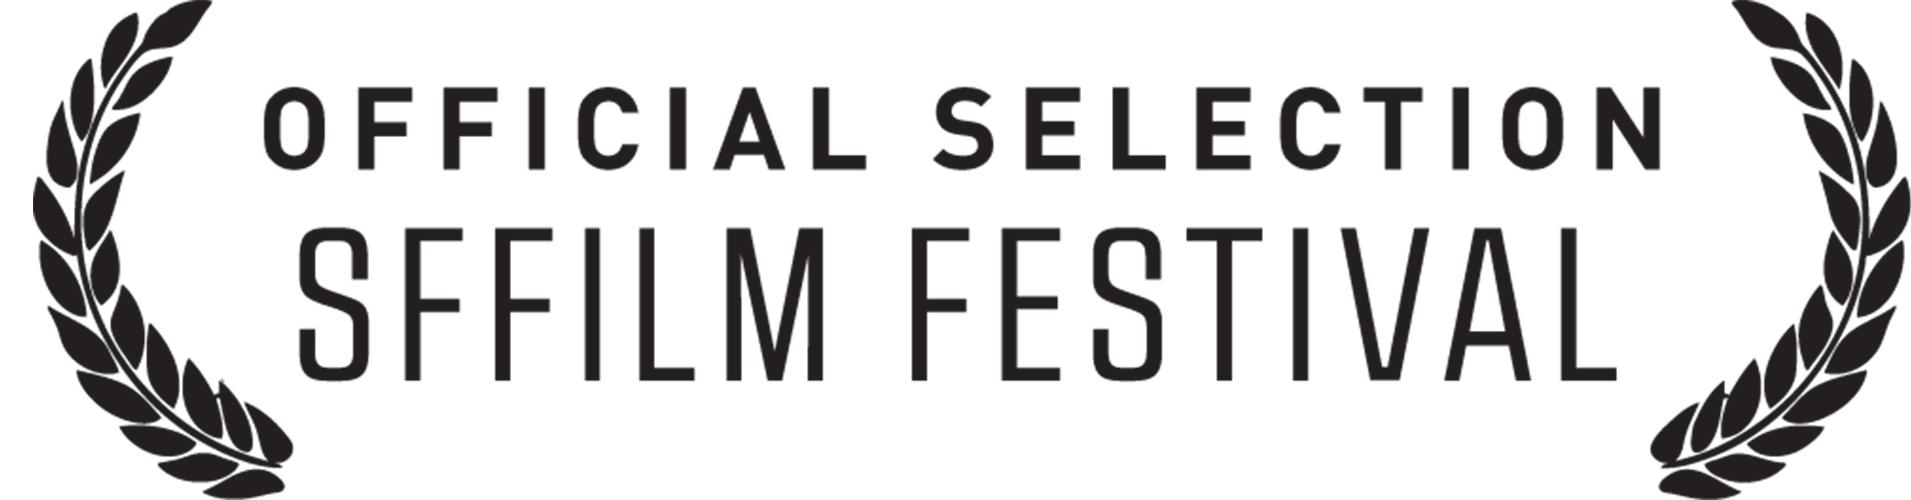 SFFILM_Laurel-OffSelec_For website.jpg